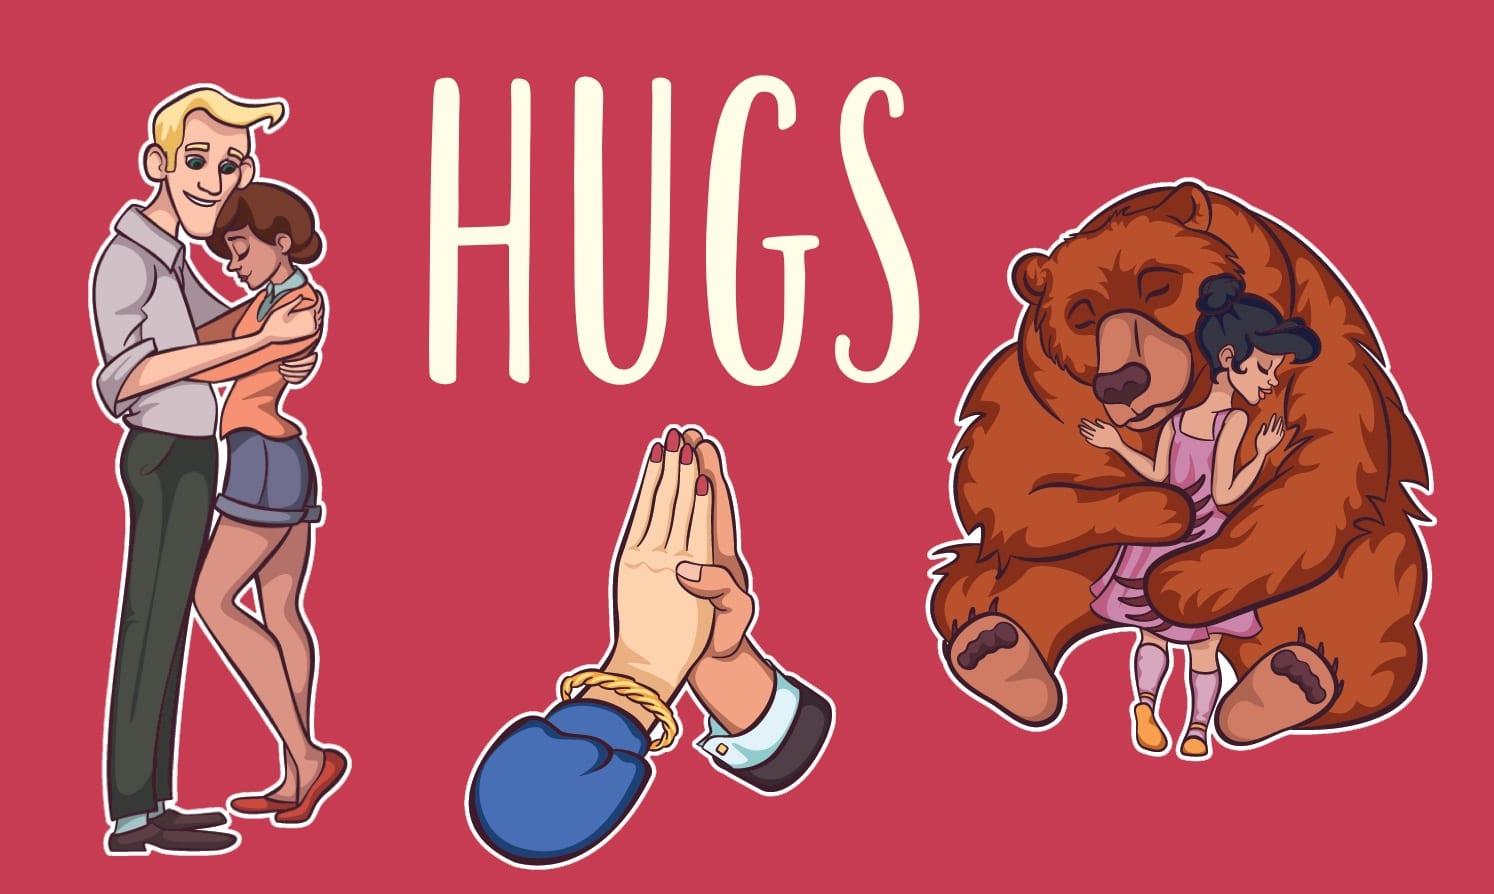 Hugs card game